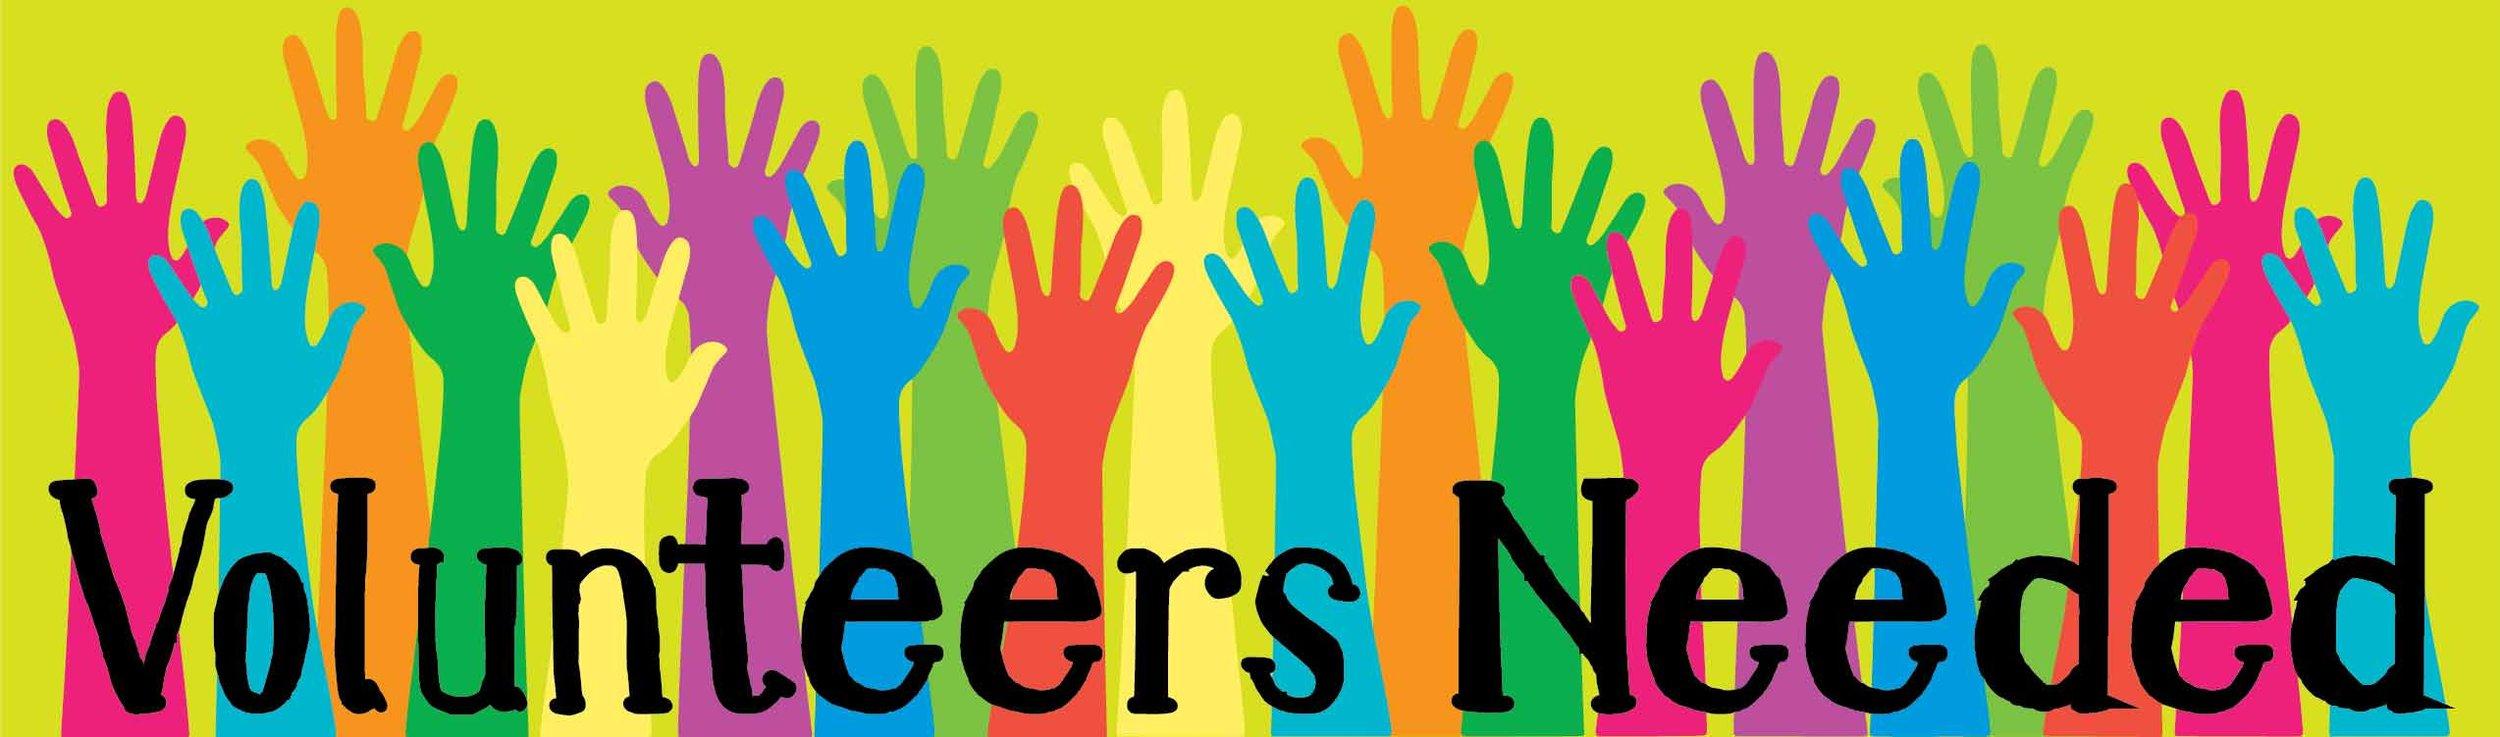 Volunteer-Hands-2_web.jpg